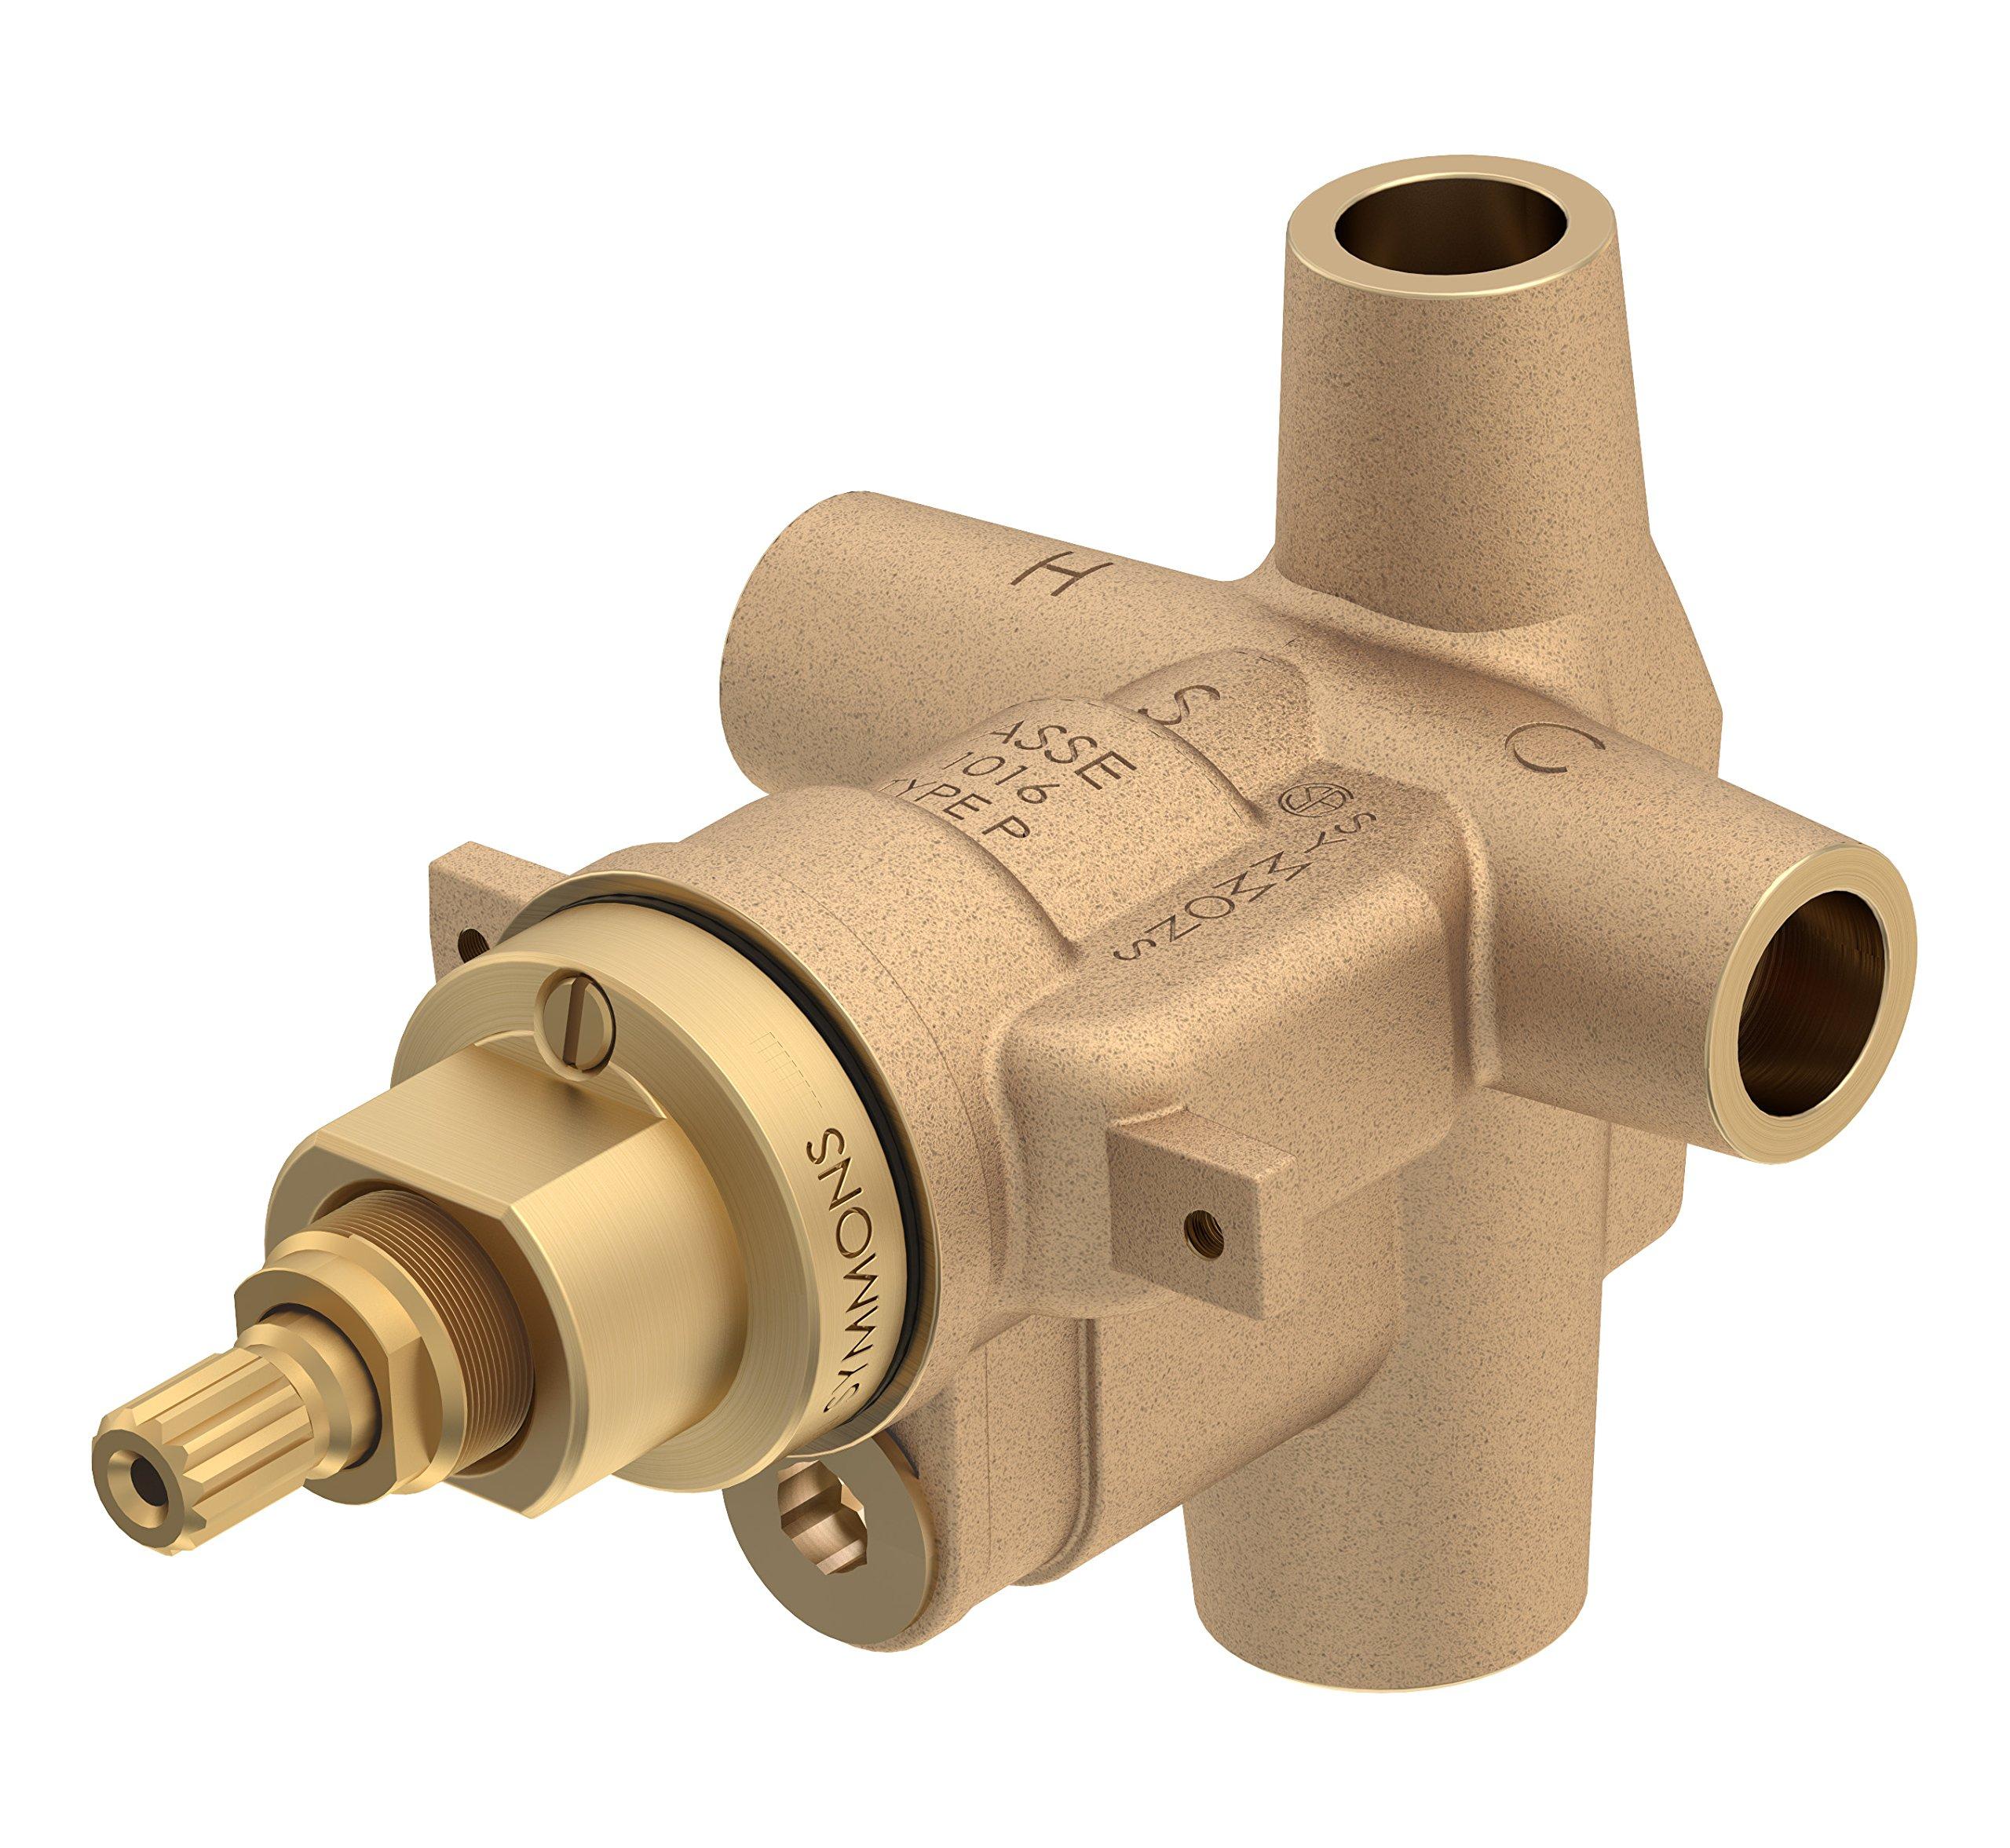 Symmons S-46-1-BODY Temptrol Pressure Balancing Shower Valve Body with Volume Control